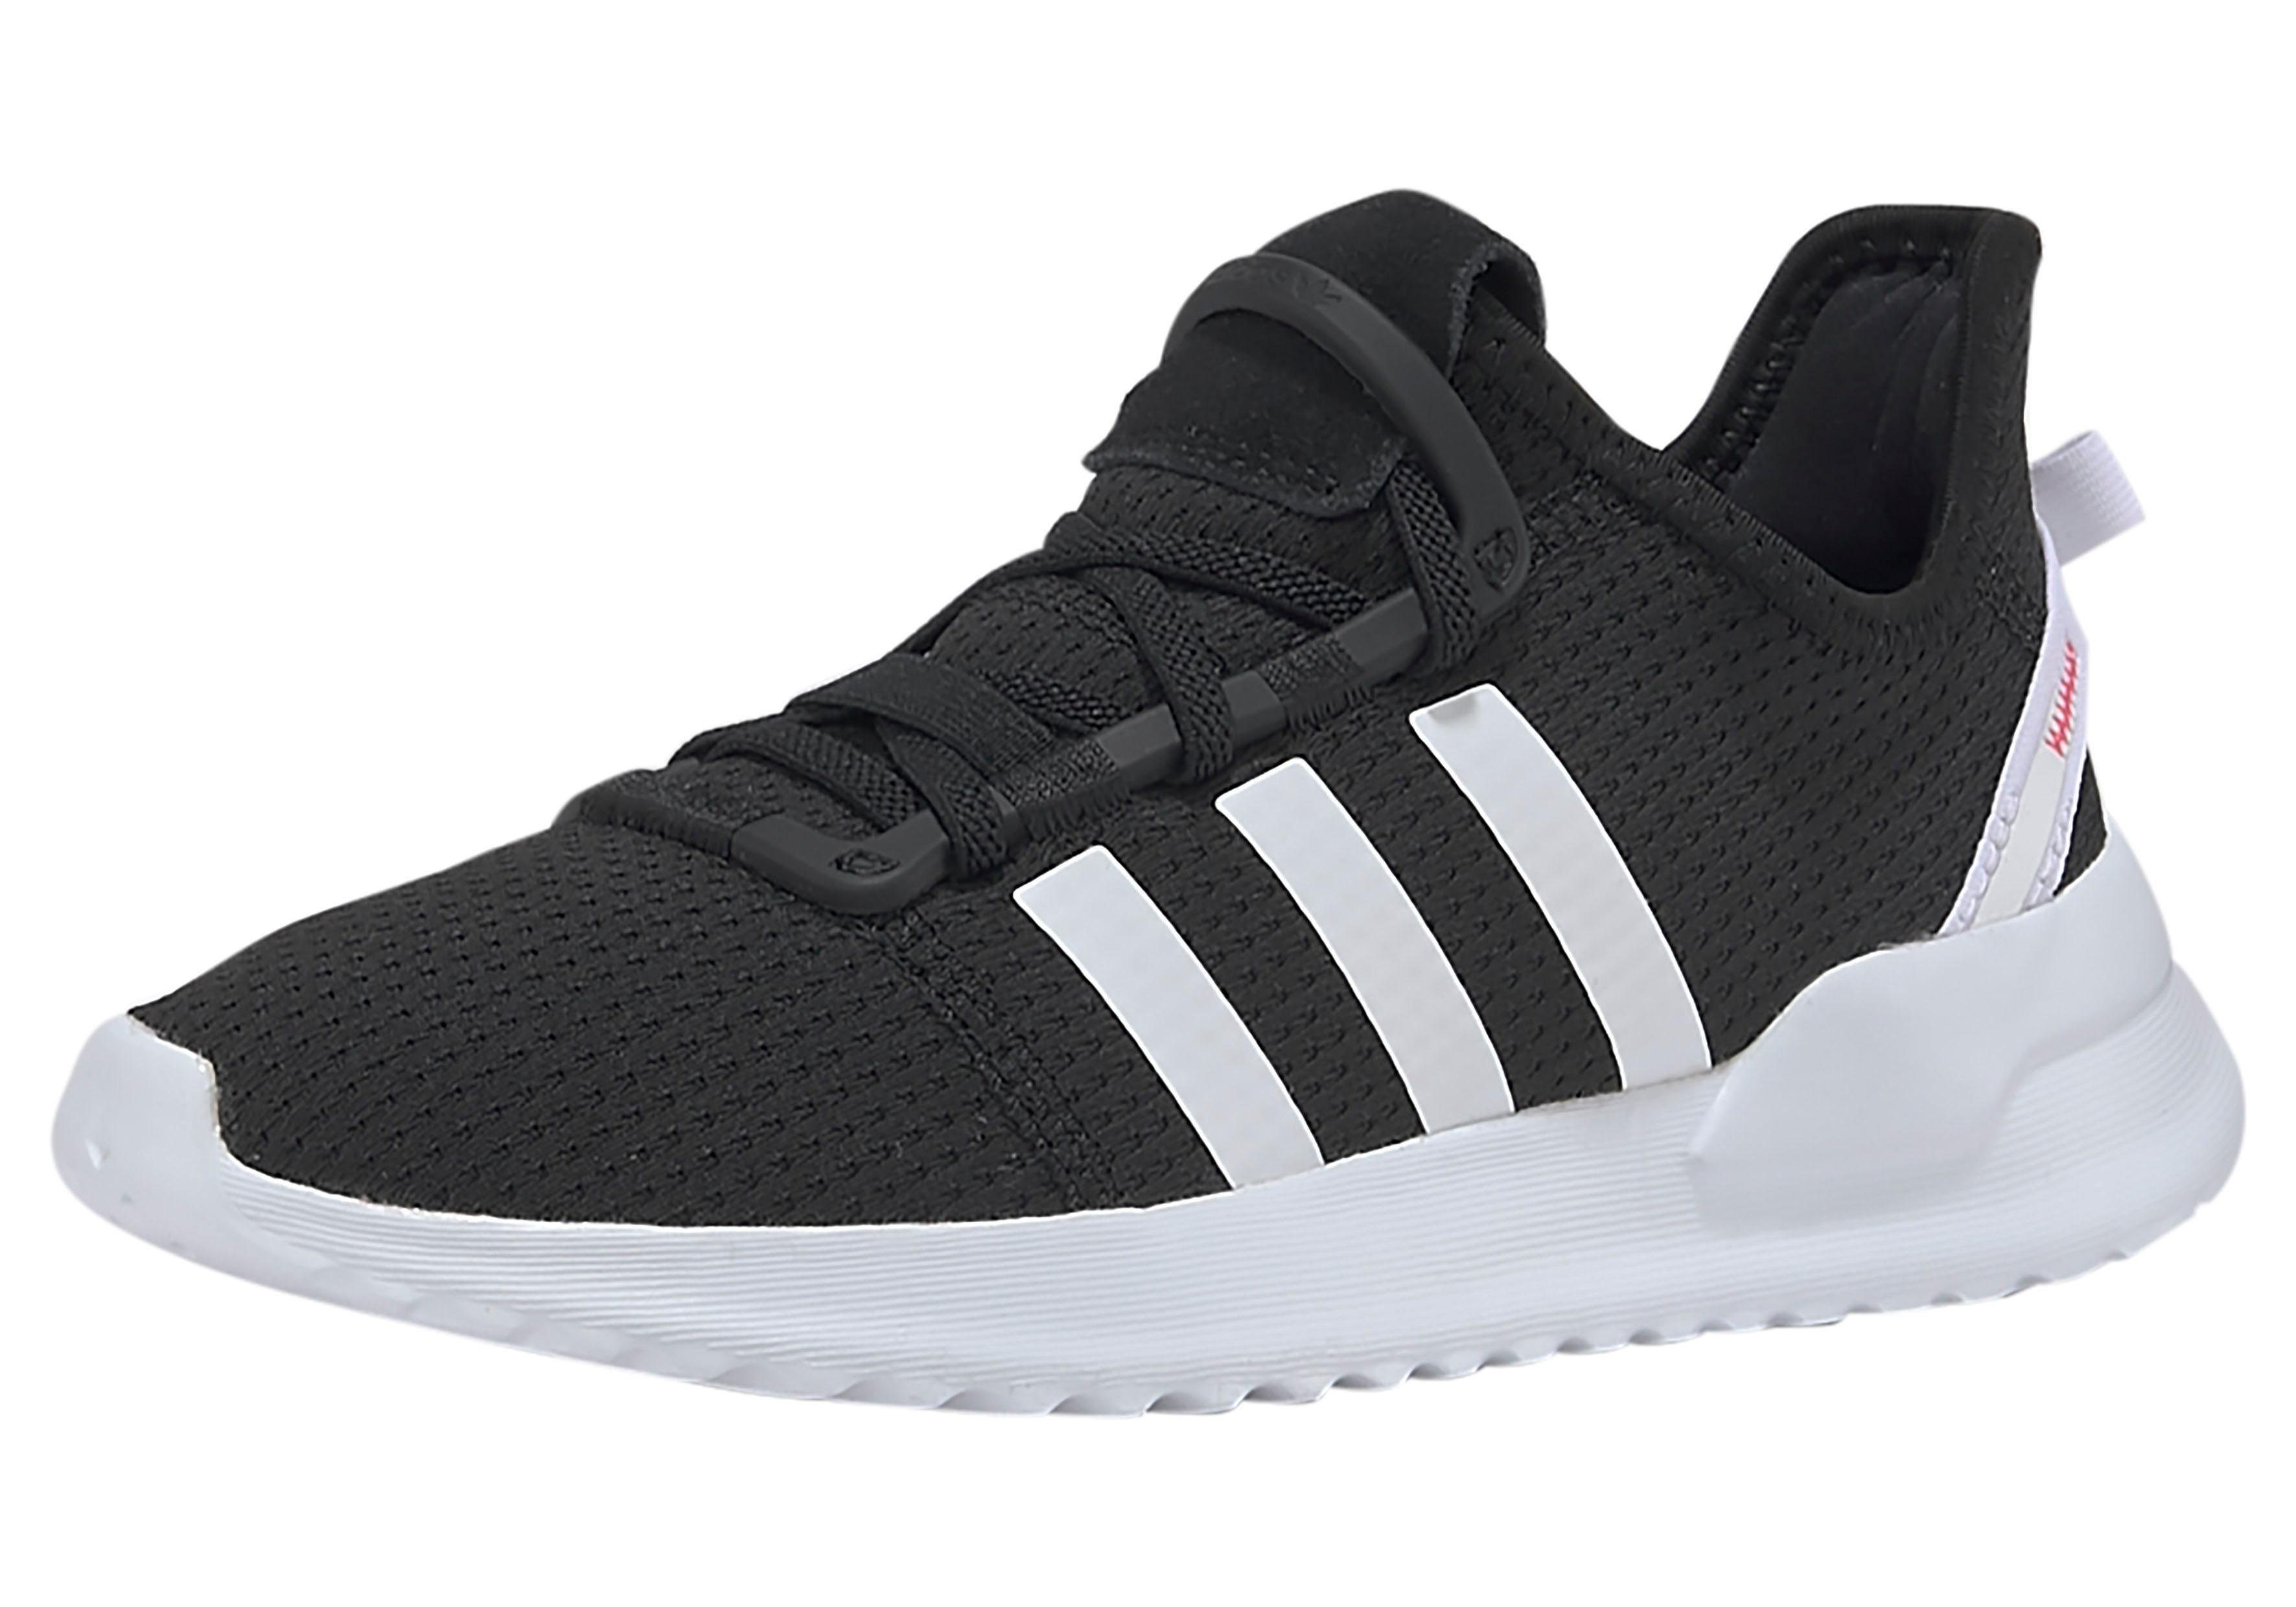 adidas Originals »U_PATH RUN J« Sneaker, Knöchelhoher Sneaker von adidas Originals online kaufen   OTTO